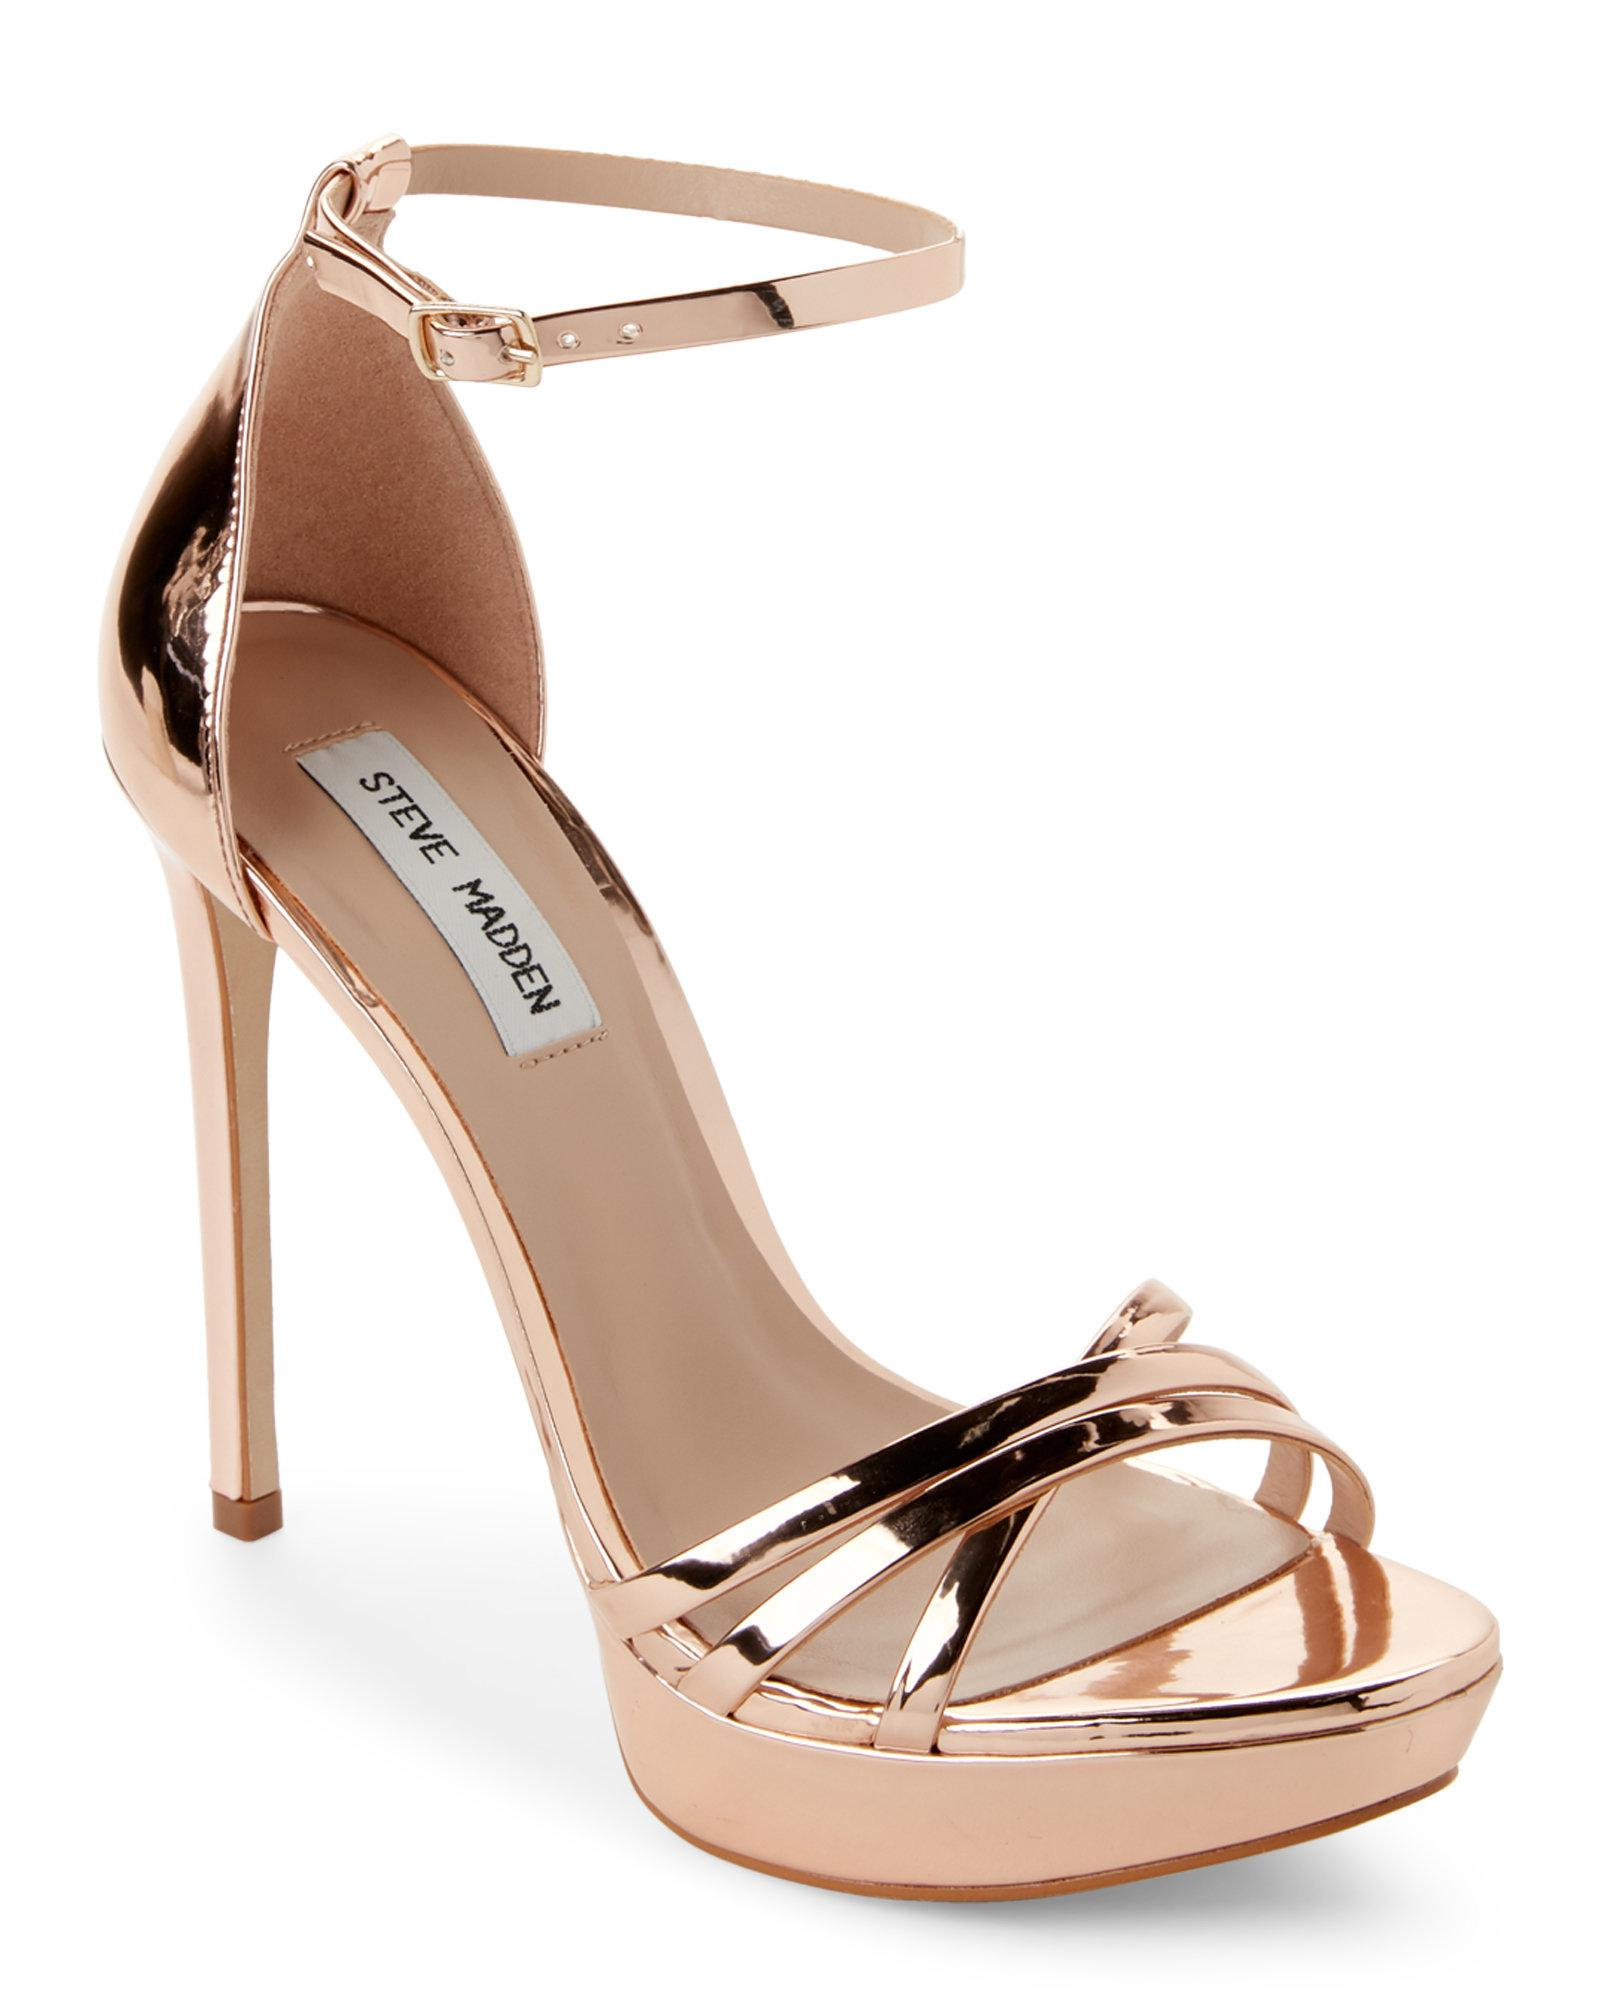 5c6095923 Steve Madden Rose Gold Cassandra Metallic Strappy Platform Sandals ...